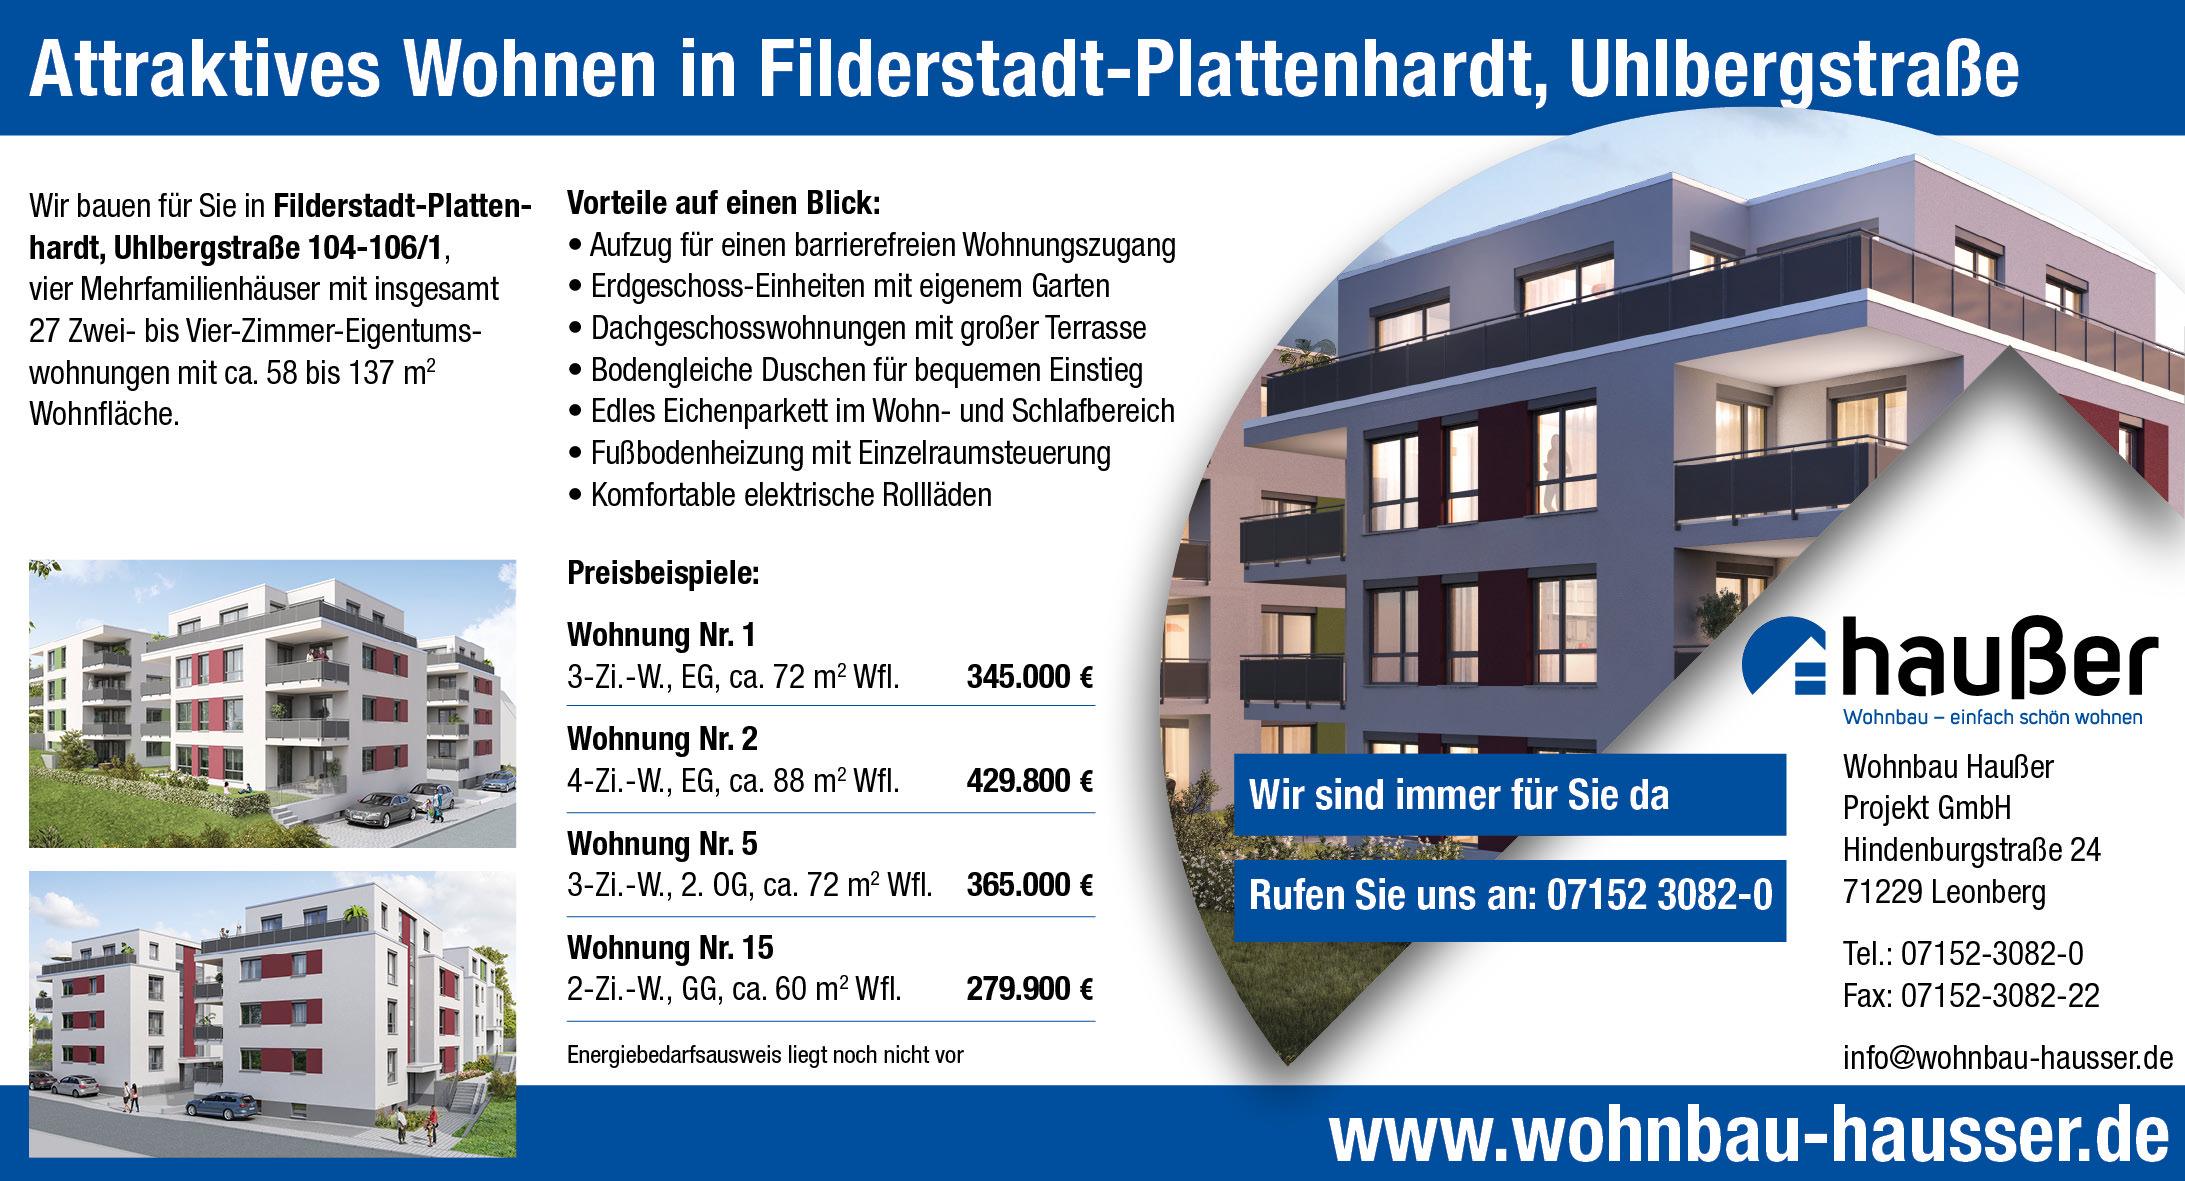 WH_AZ_1.2.01.07_Filderstadt-Pl_Uhlbergstr._185x100mm_4c_2019_08_05